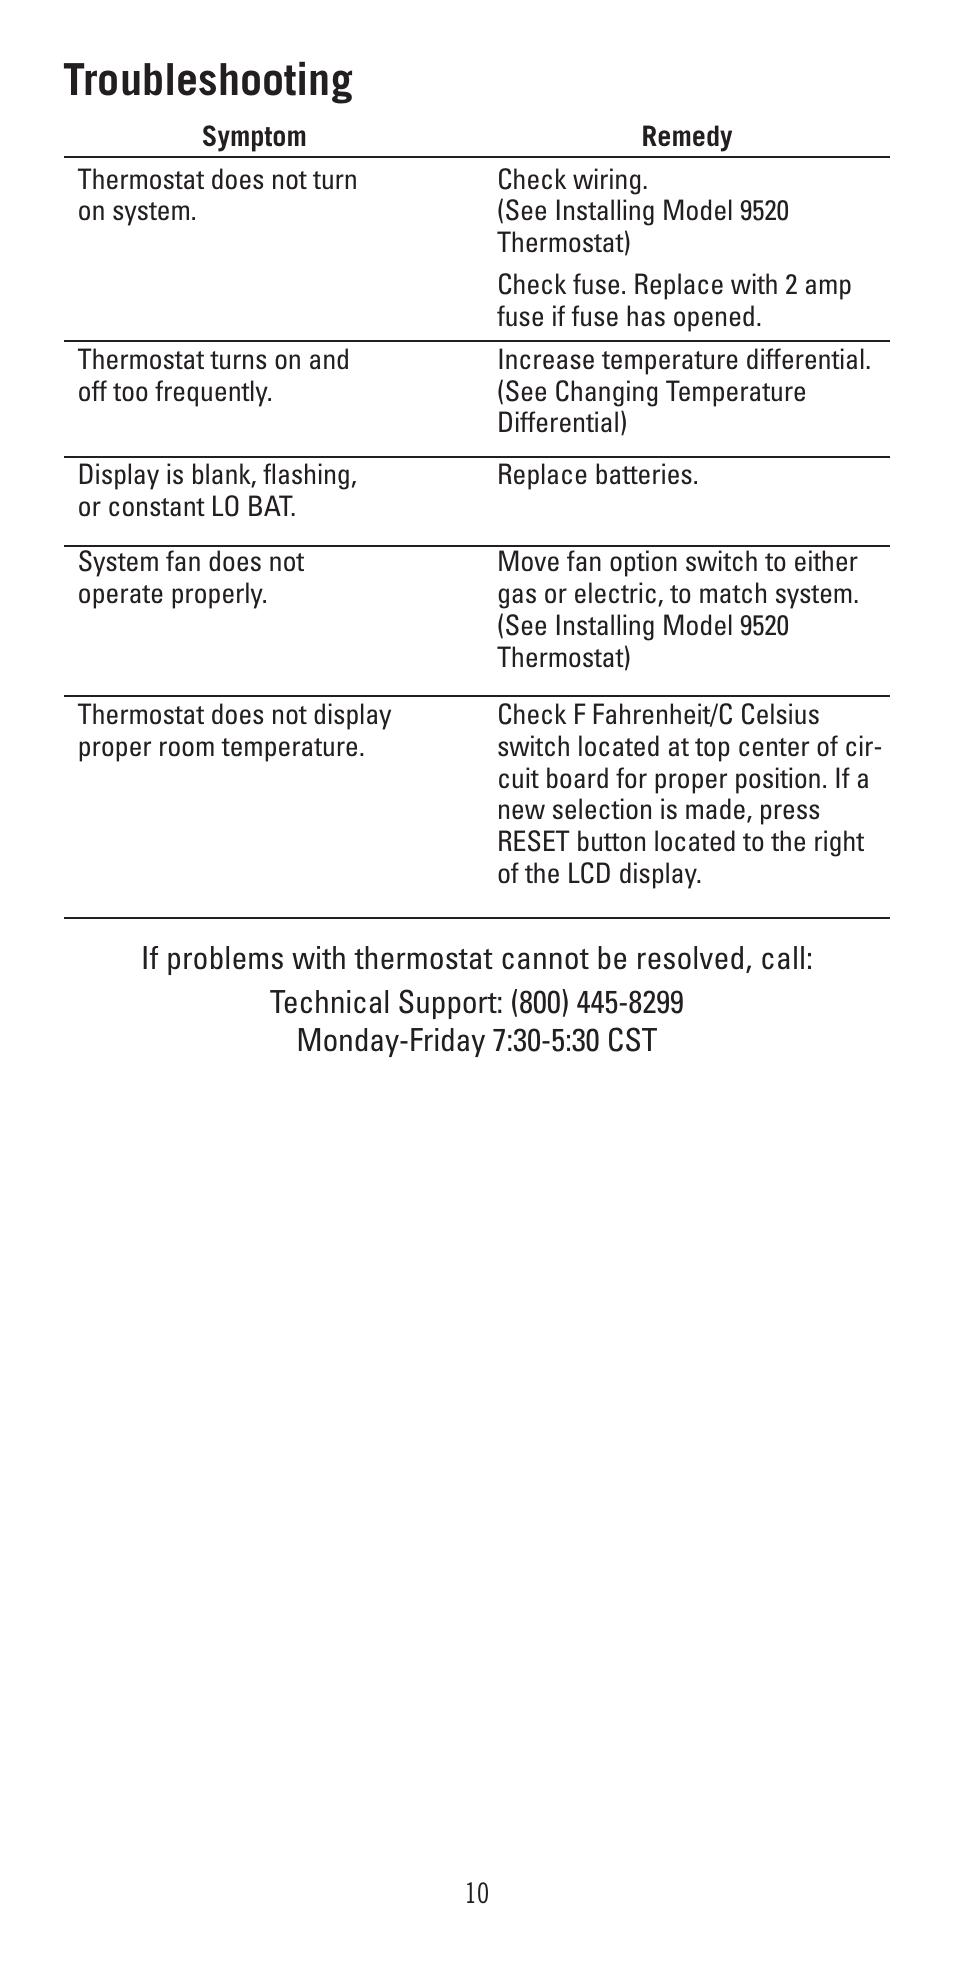 Robertshaw 9520 Wiring Diagram - Wiring Diagram on johnson controls thermostat wiring diagram, trane thermostat wiring diagram, coleman thermostat wiring diagram, portable heater wiring diagram, wards thermostat wiring diagram, luxaire thermostat wiring diagram, comfortmaker thermostat wiring diagram, ecobee thermostat wiring diagram, frigidaire thermostat wiring diagram, fedders thermostat wiring diagram, robertshaw 9620 thermostat wiring layout, split system heat pump wiring diagram, programmable thermostat wiring diagram, commercial defrost timer wiring diagram, electric baseboard heater thermostat wiring diagram, emerson thermostat wiring diagram, watts thermostat wiring diagram, york thermostat wiring diagram, suntouch thermostat wiring diagram, honeywell thermostat wiring diagram,